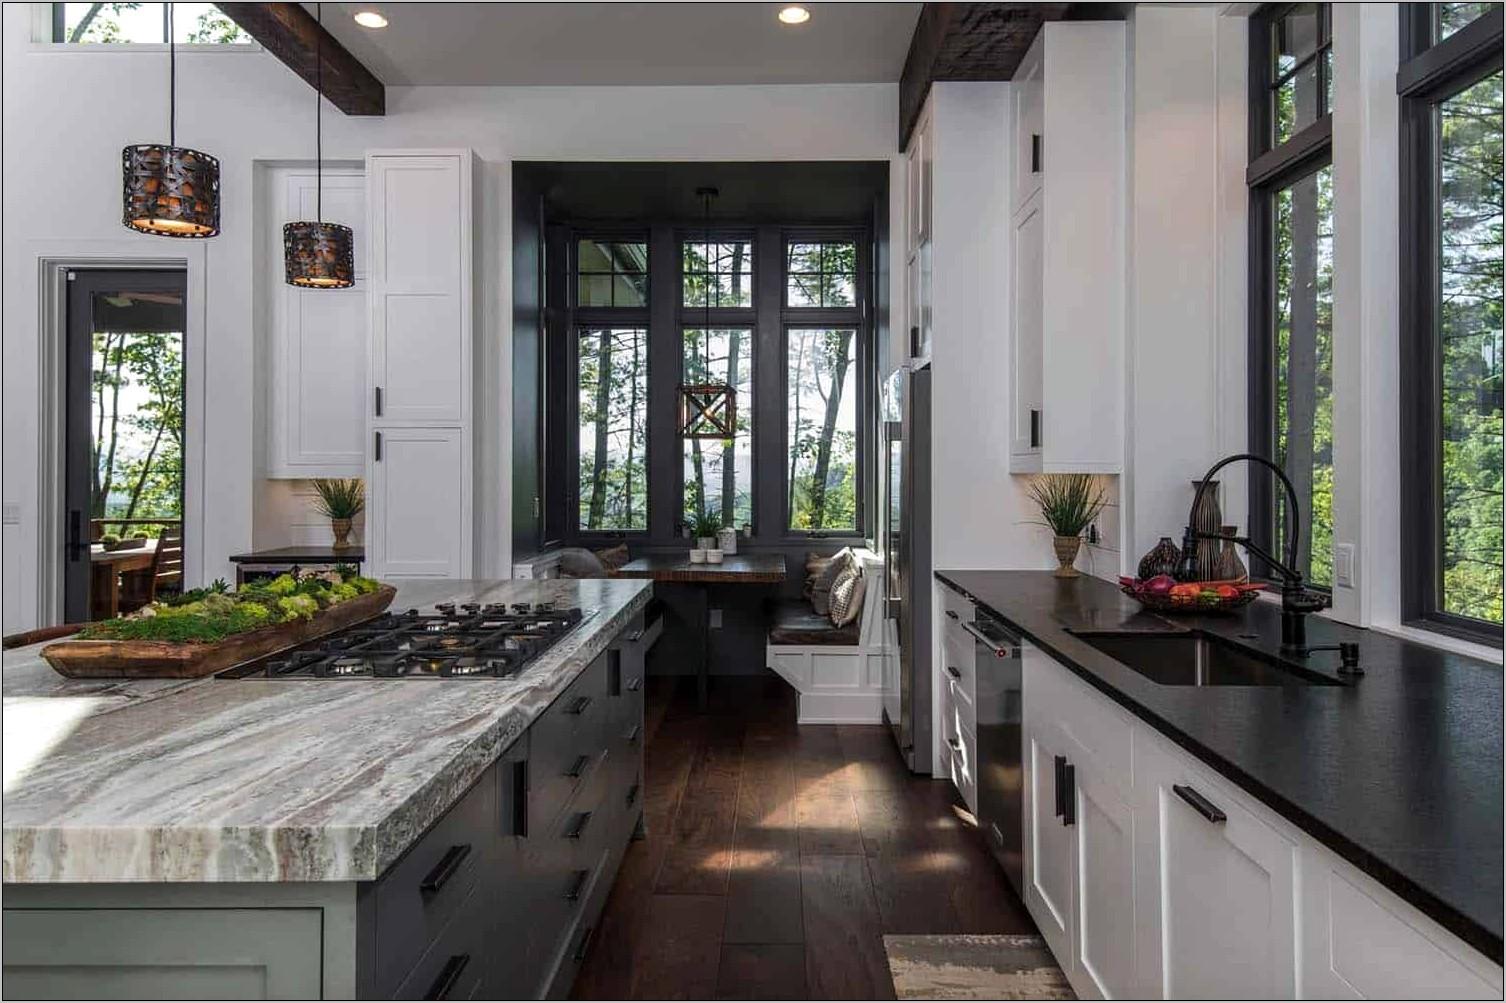 North Carolina Mountain Kitchen Decor Pictures